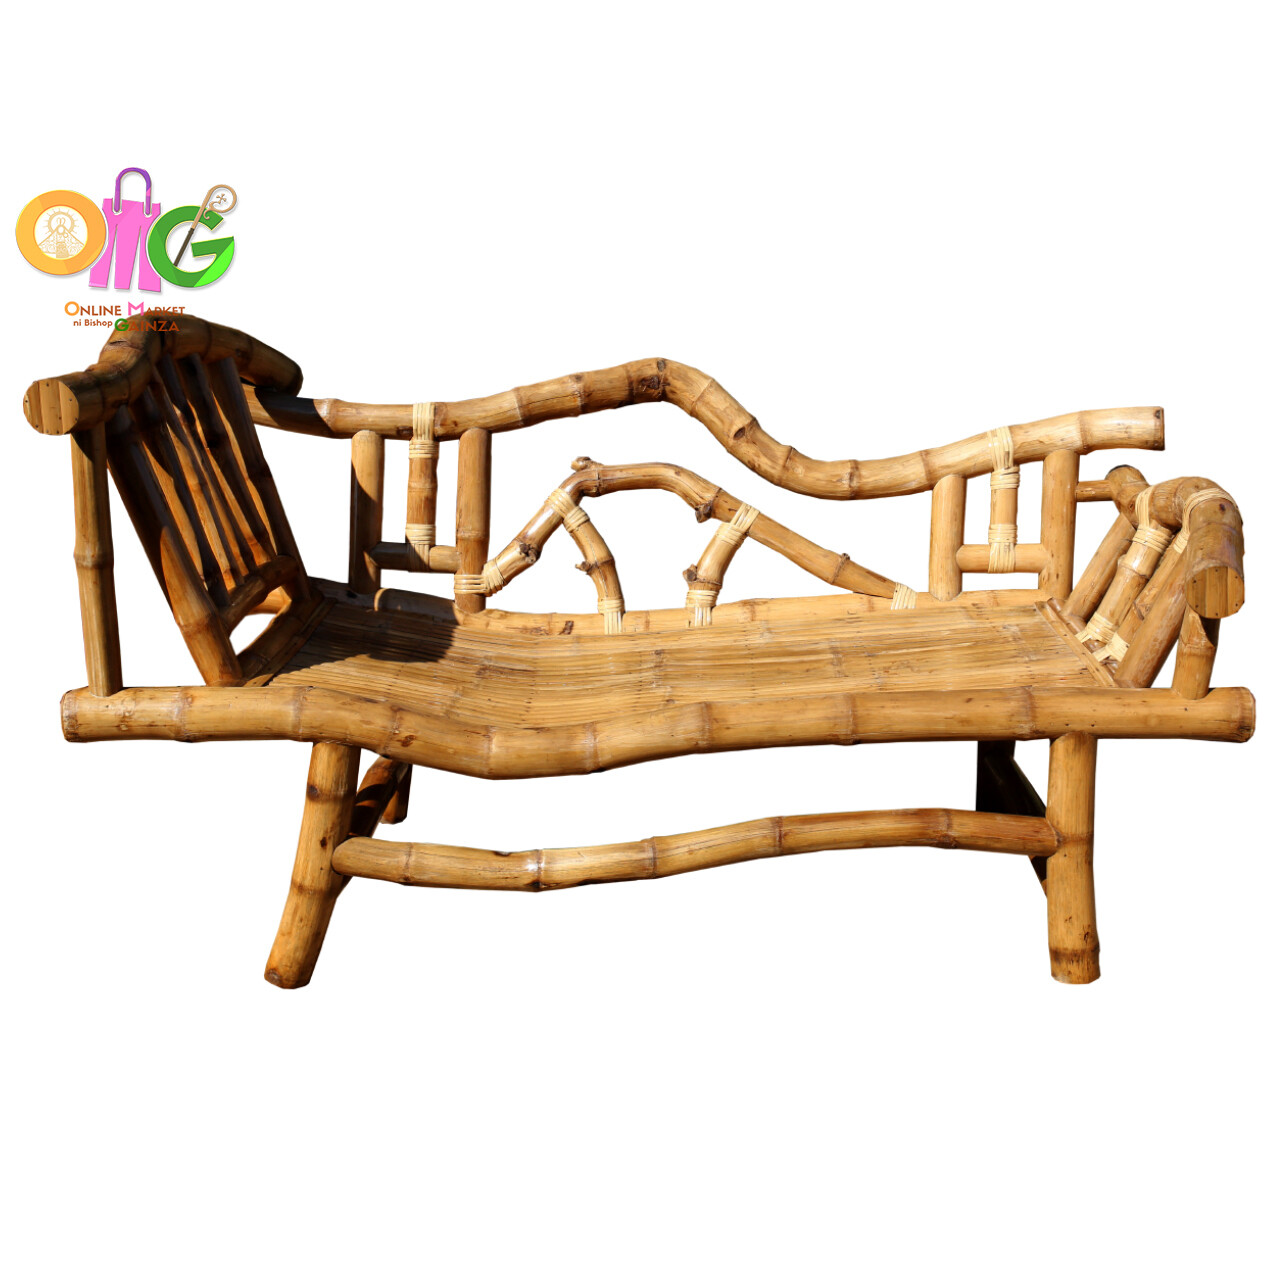 Sir Zaldy Furniture - Bamboo Sofa Bed